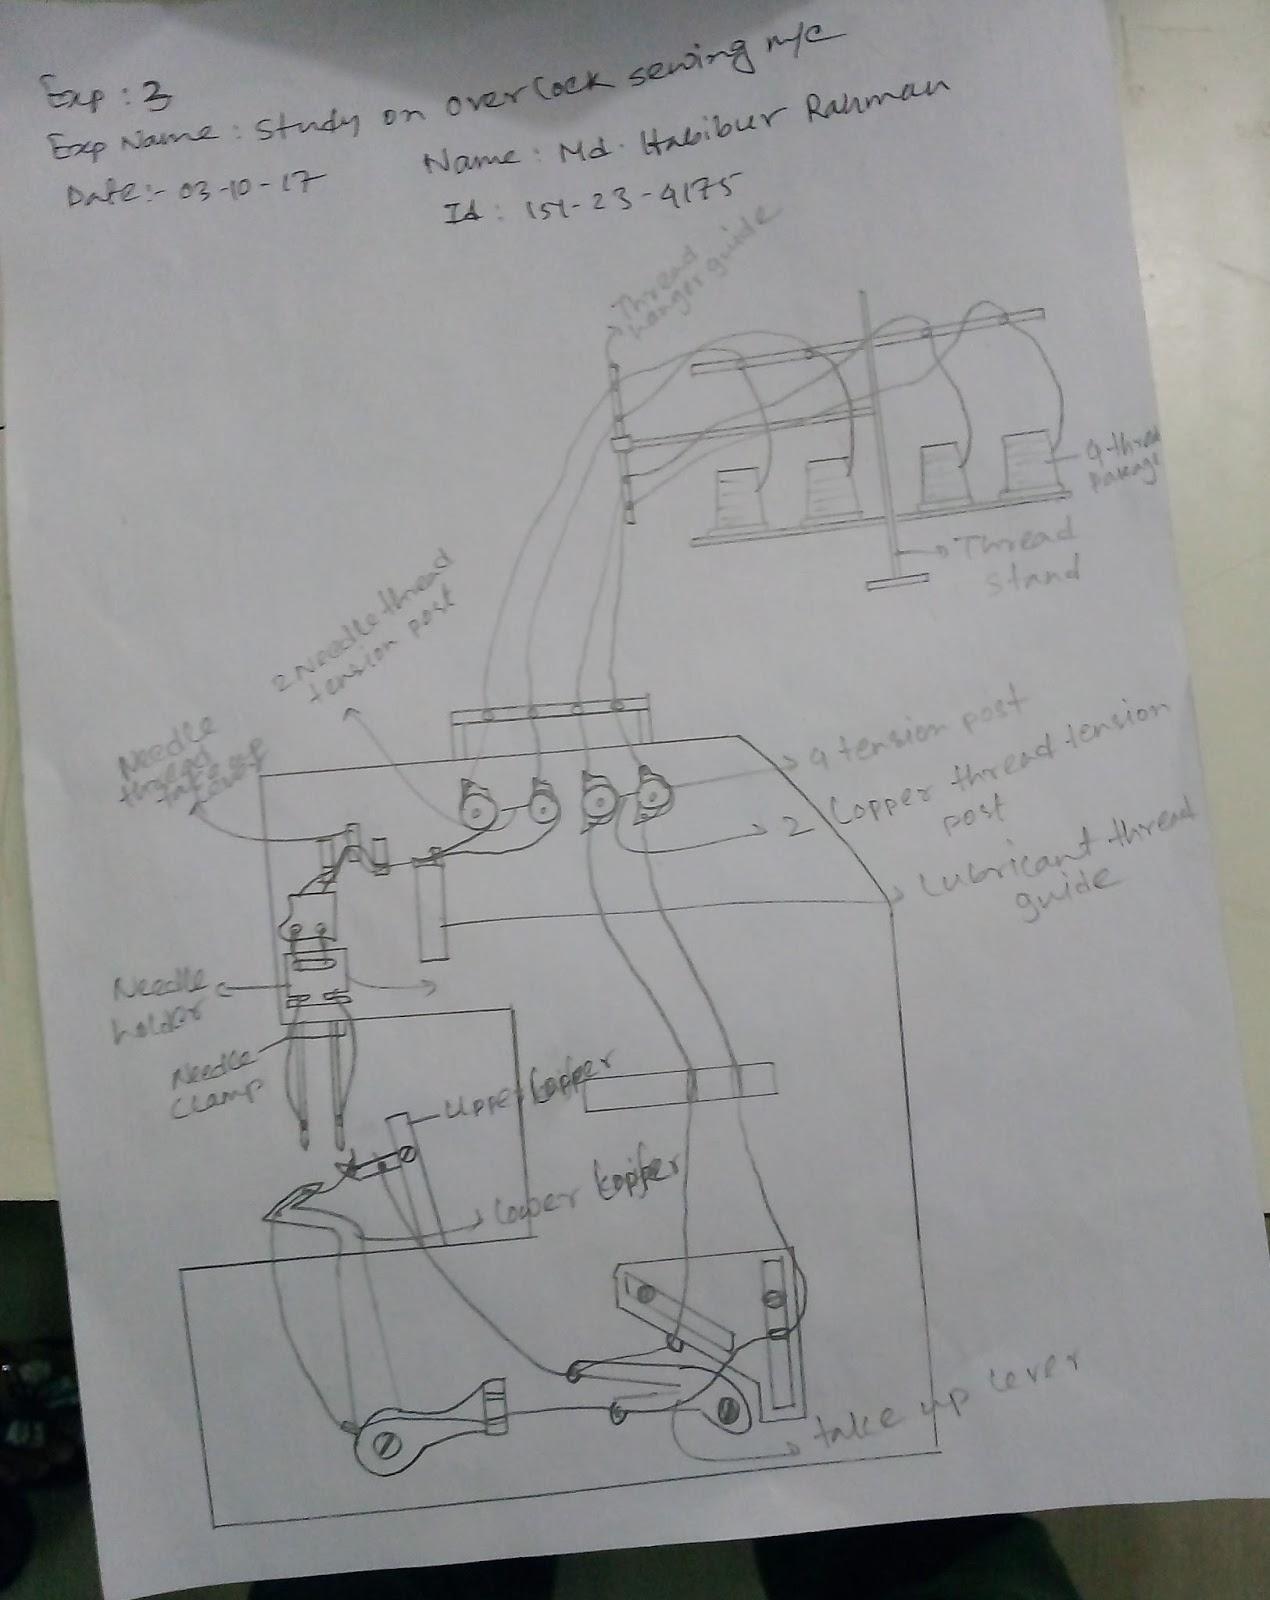 Study On Over Lock Sewing Machine Diagram 1 Rmp2850 2 Power 250 Watt 3 Voltage 220v 4 Hp